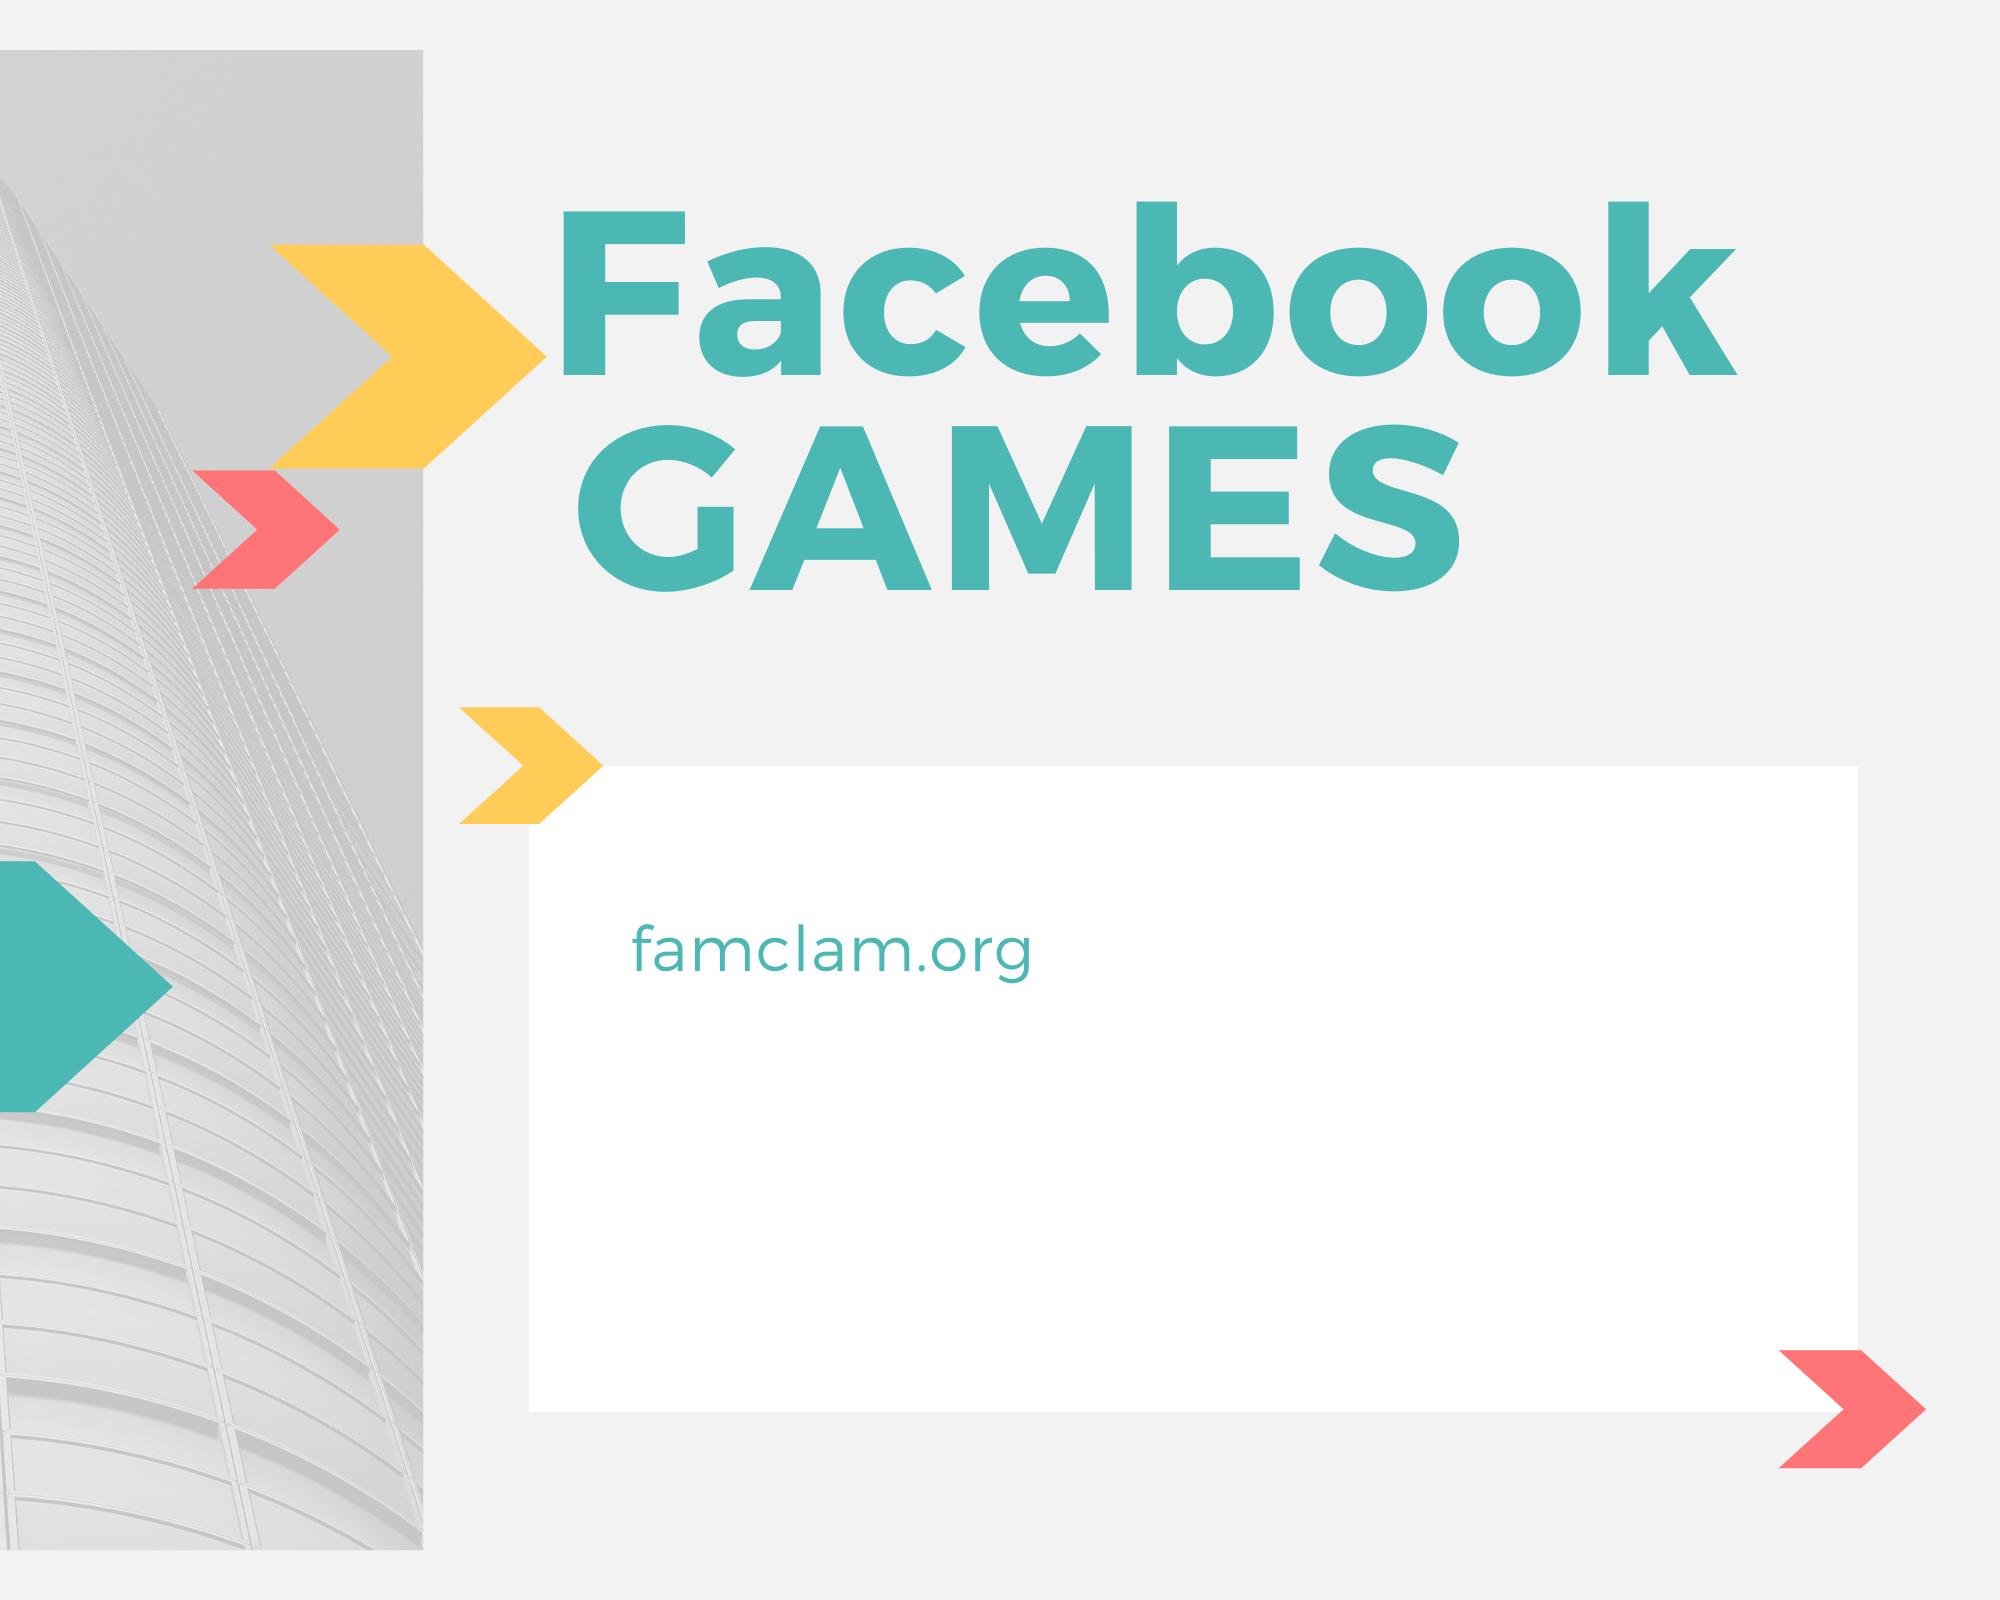 facebook games 2020